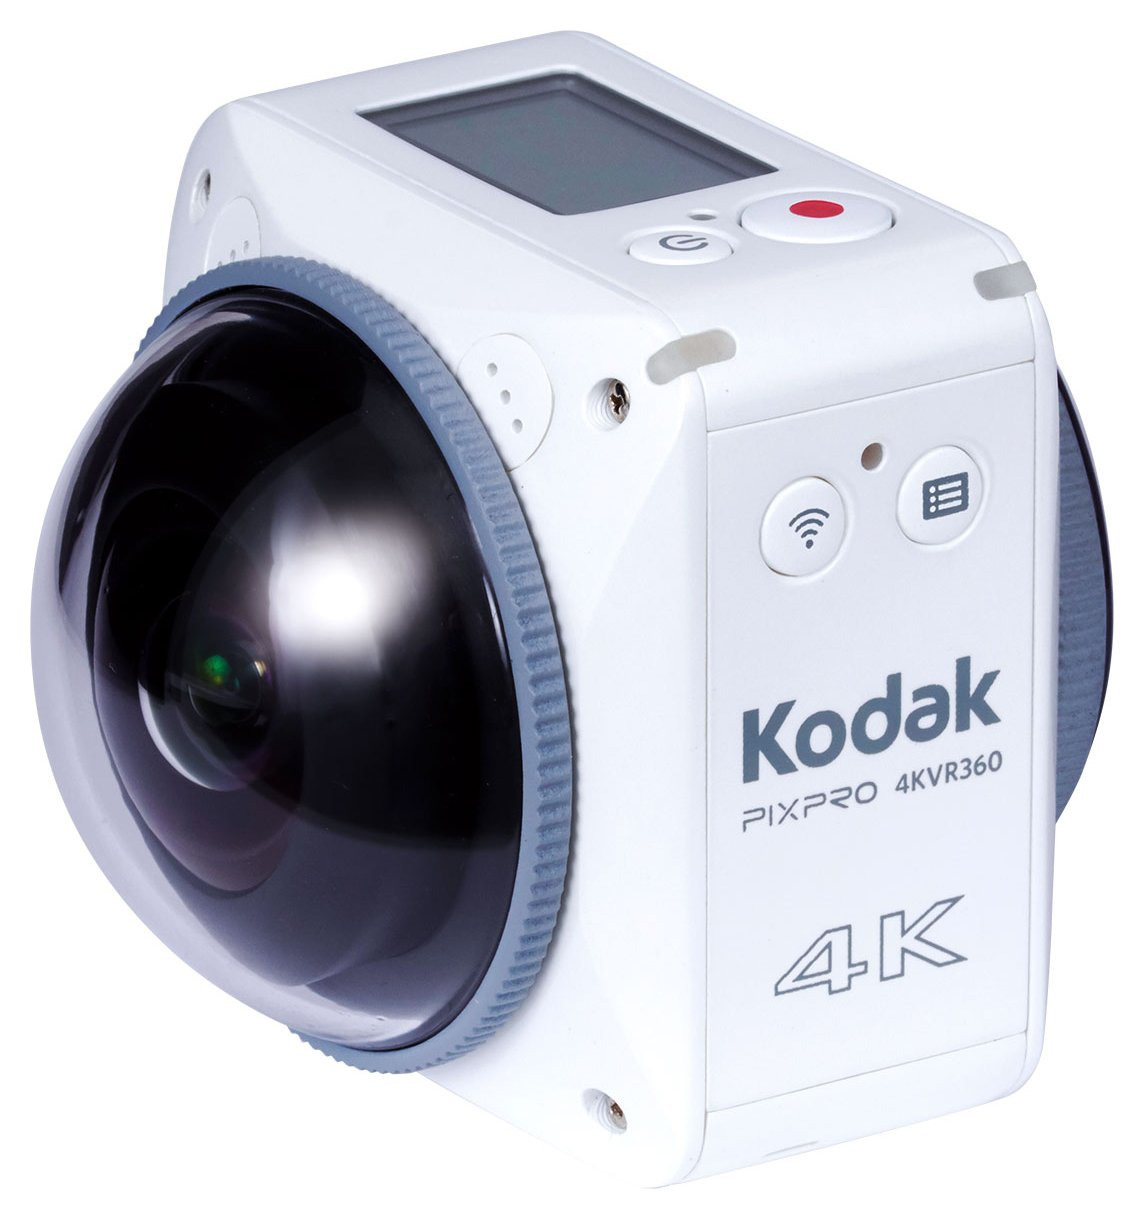 Kodak Pixpro SP360 4K VR 360 Degree Camcorder - Black.